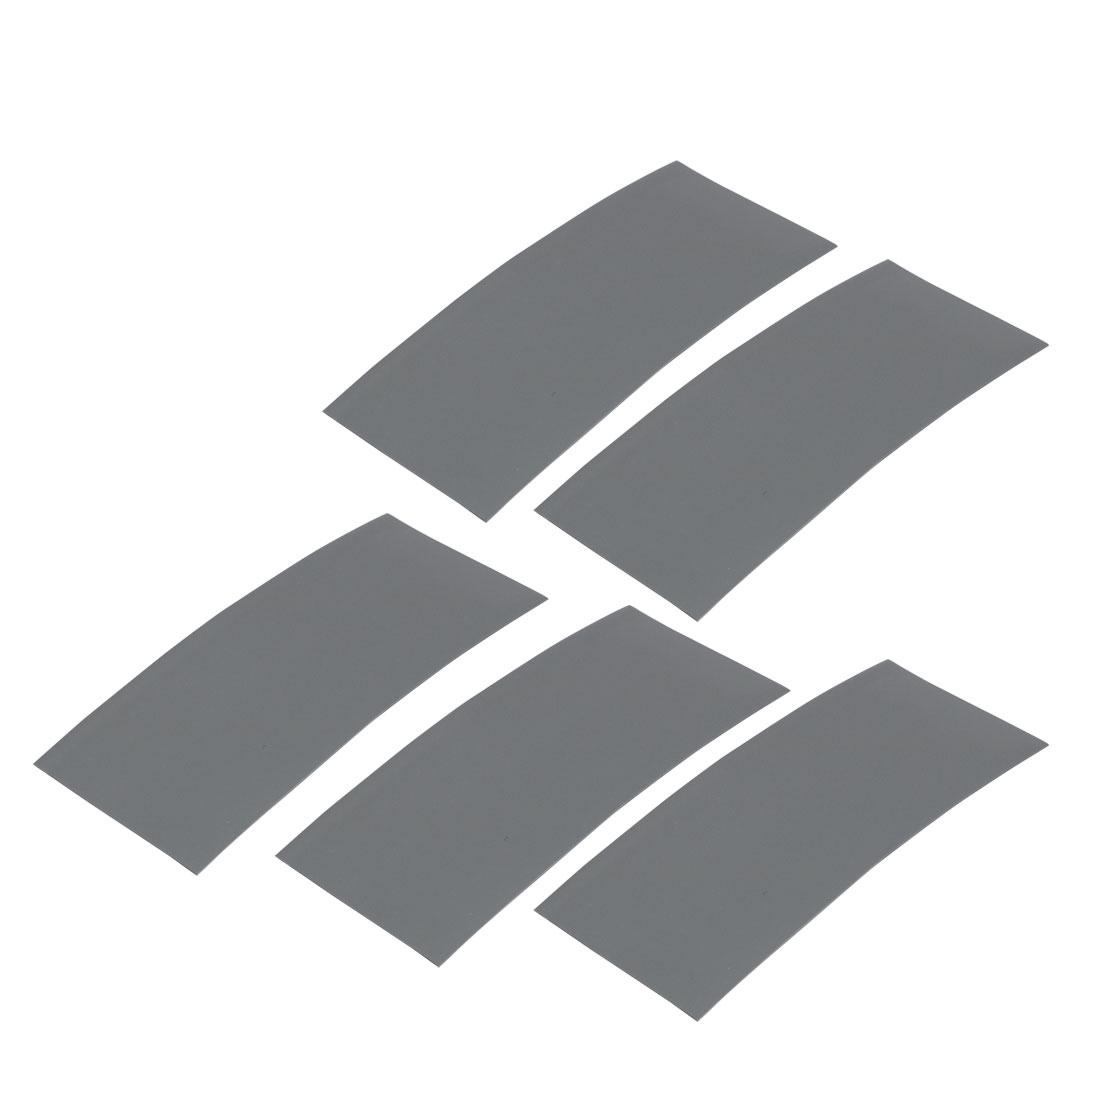 5pcs 23mm Flat Width 53mm Length PVC Heat Shrinkable Tube Gray for AA Battery